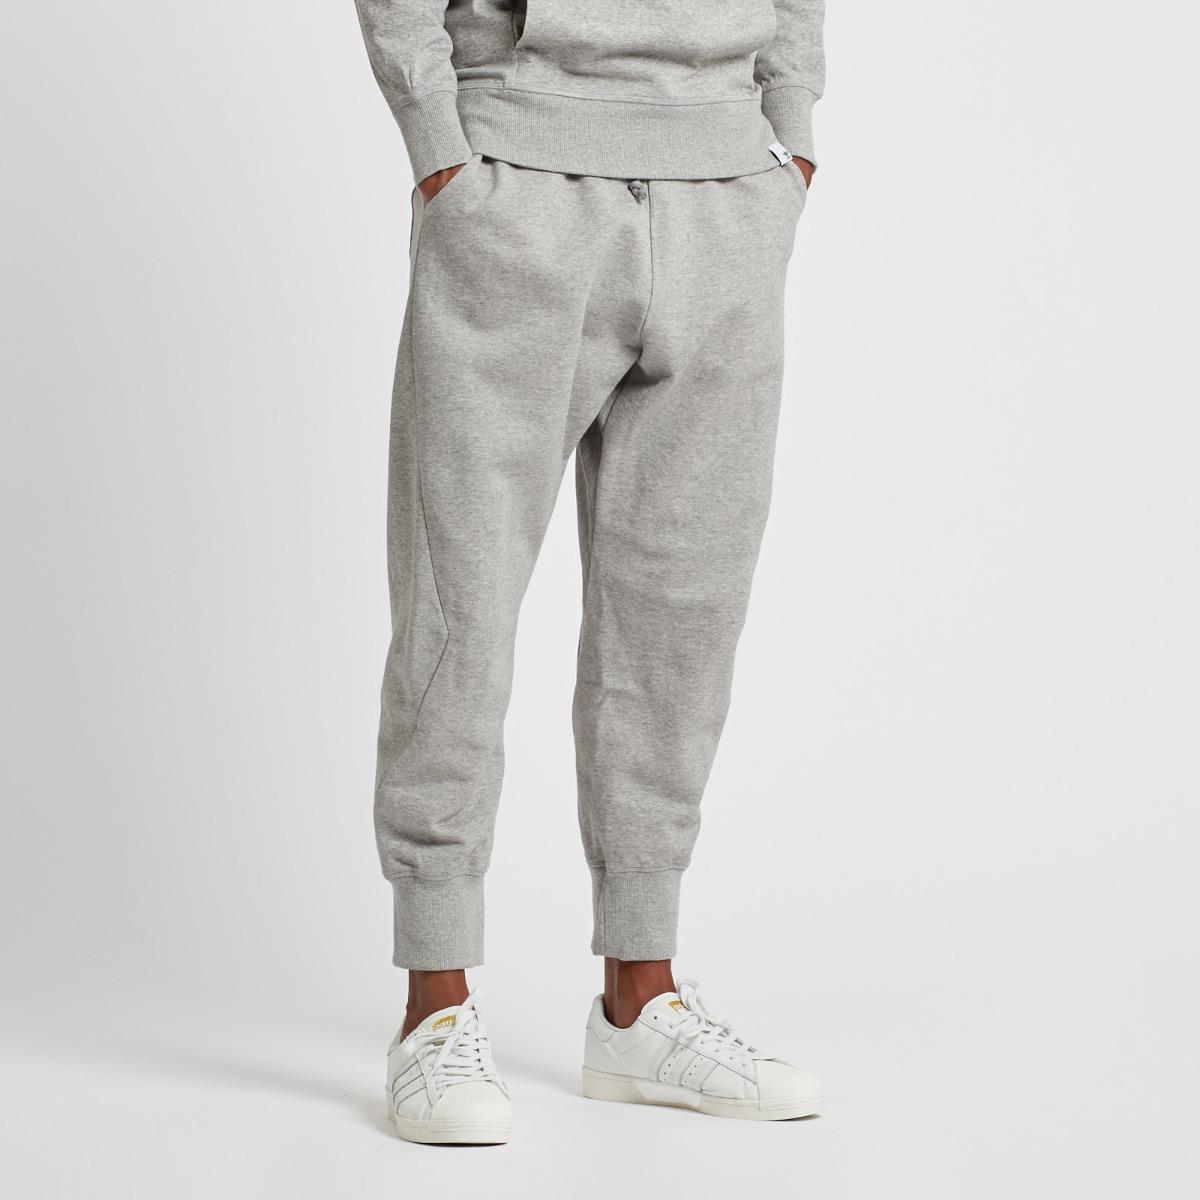 e93f82091d adidas originals xbyo by satomi nakamura pantalon sweatpants. Cargando zoom.